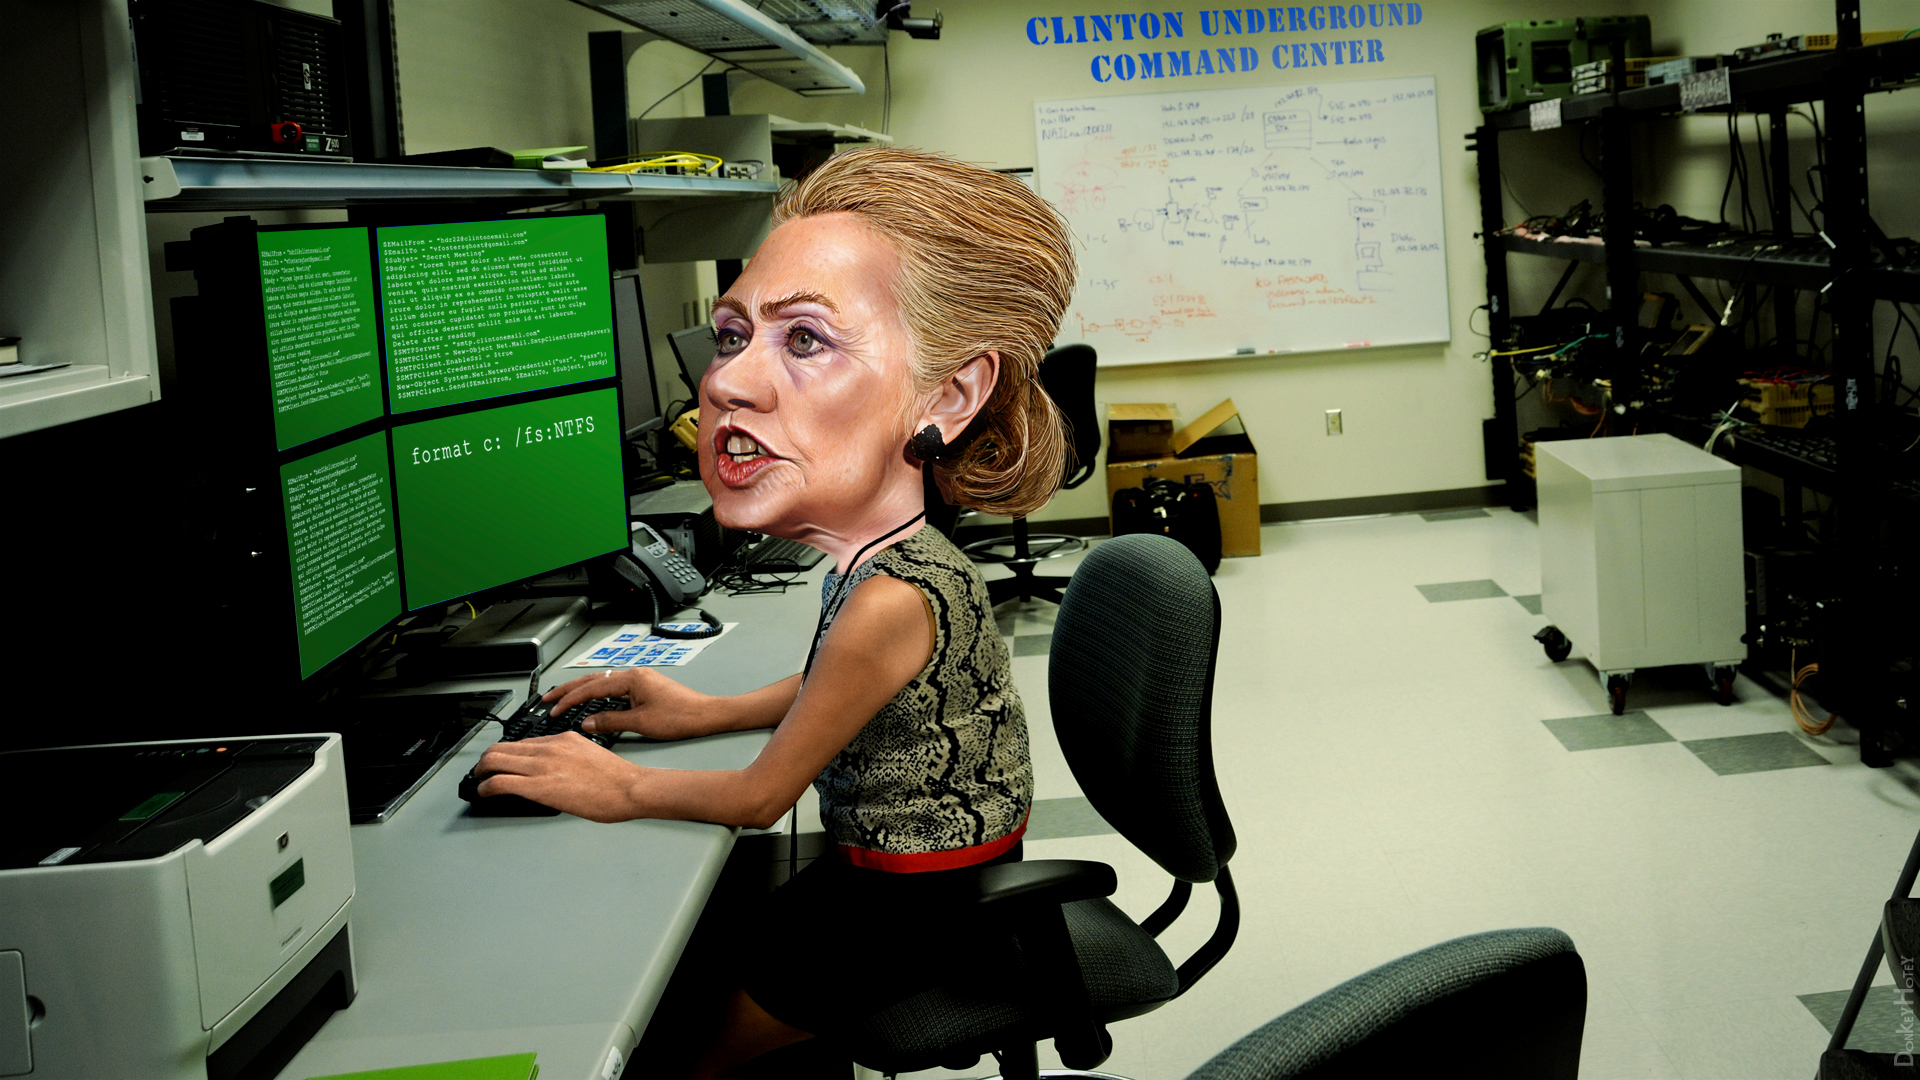 Hillary_Clinton_Underground.jpg